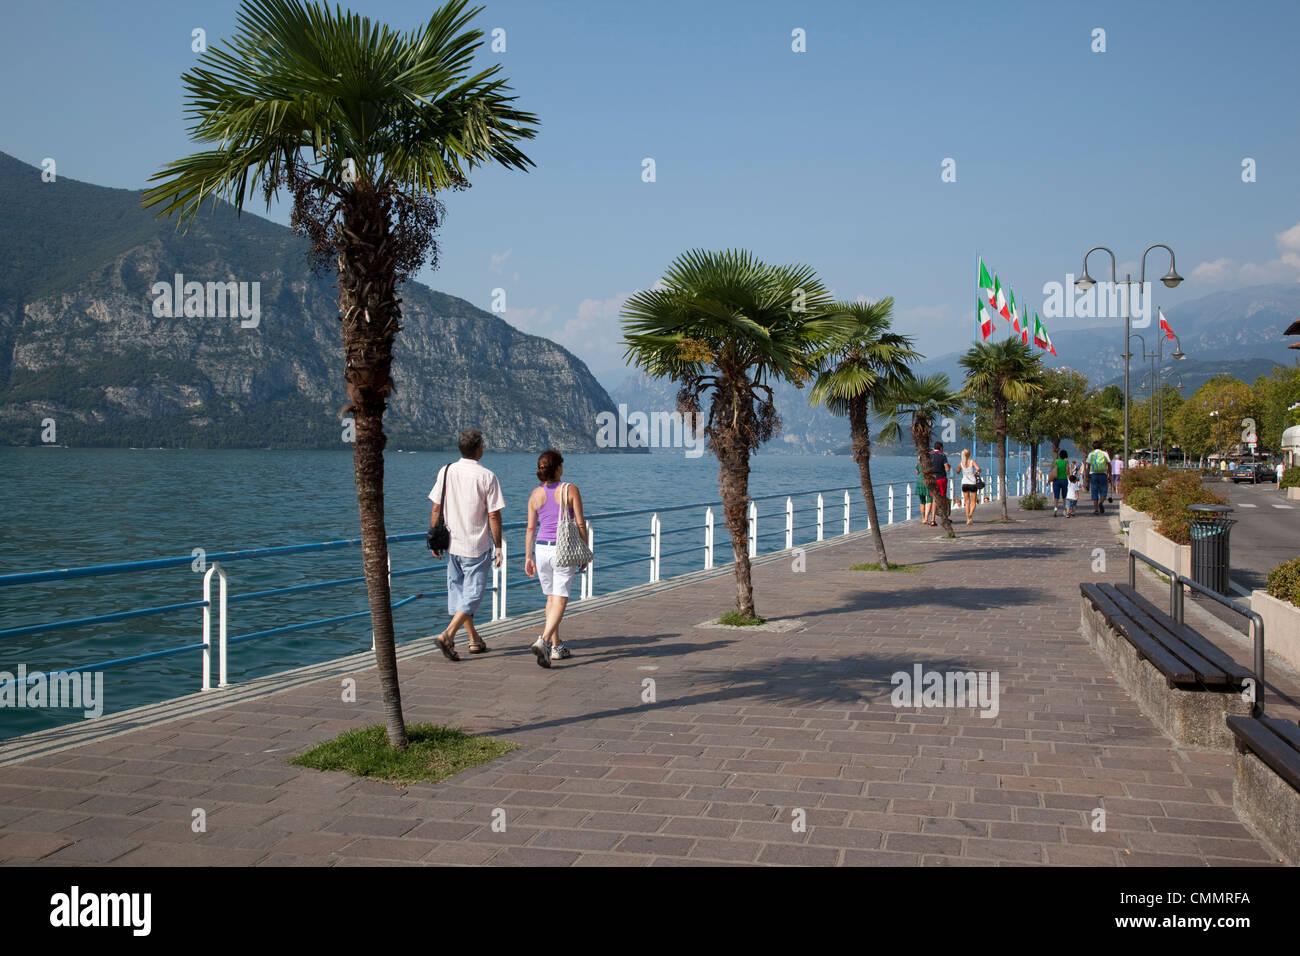 Promenade, Iseo, Lake Iseo, Lombardy, Italian Lakes, Italy, Europe - Stock Image